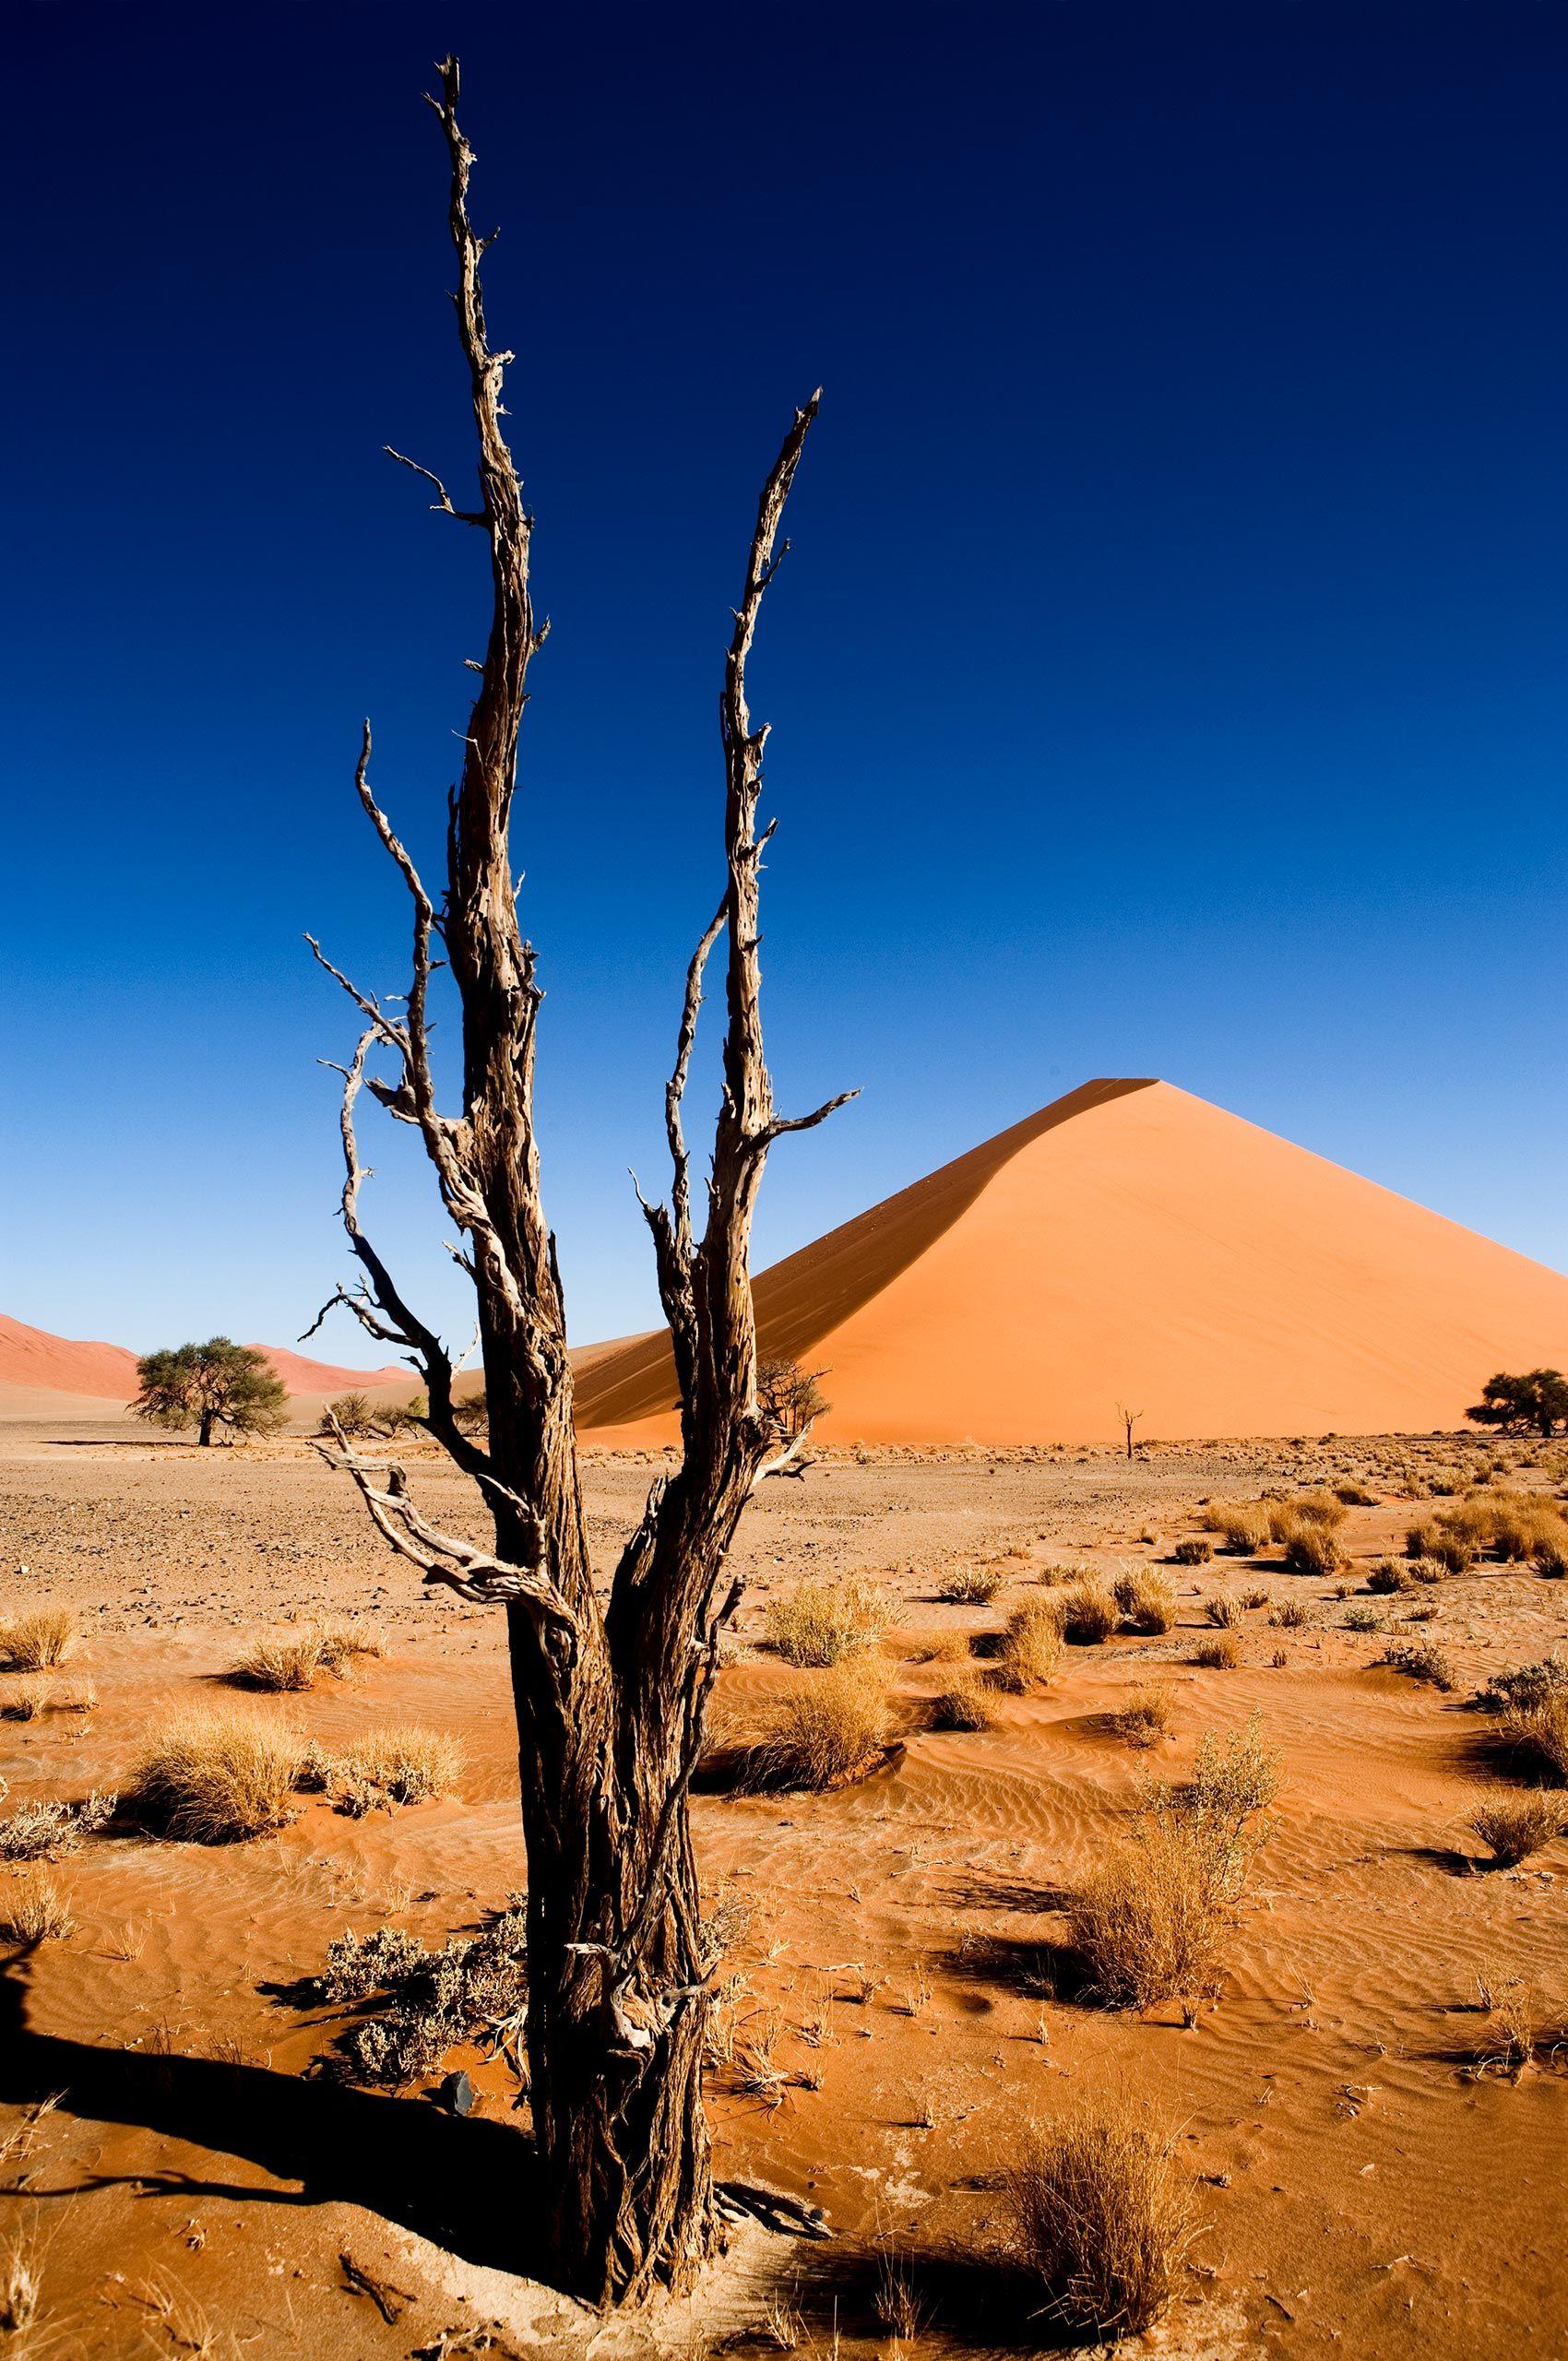 sossusvlei-tree-namibia-HenrikOlundPhotography.jpg